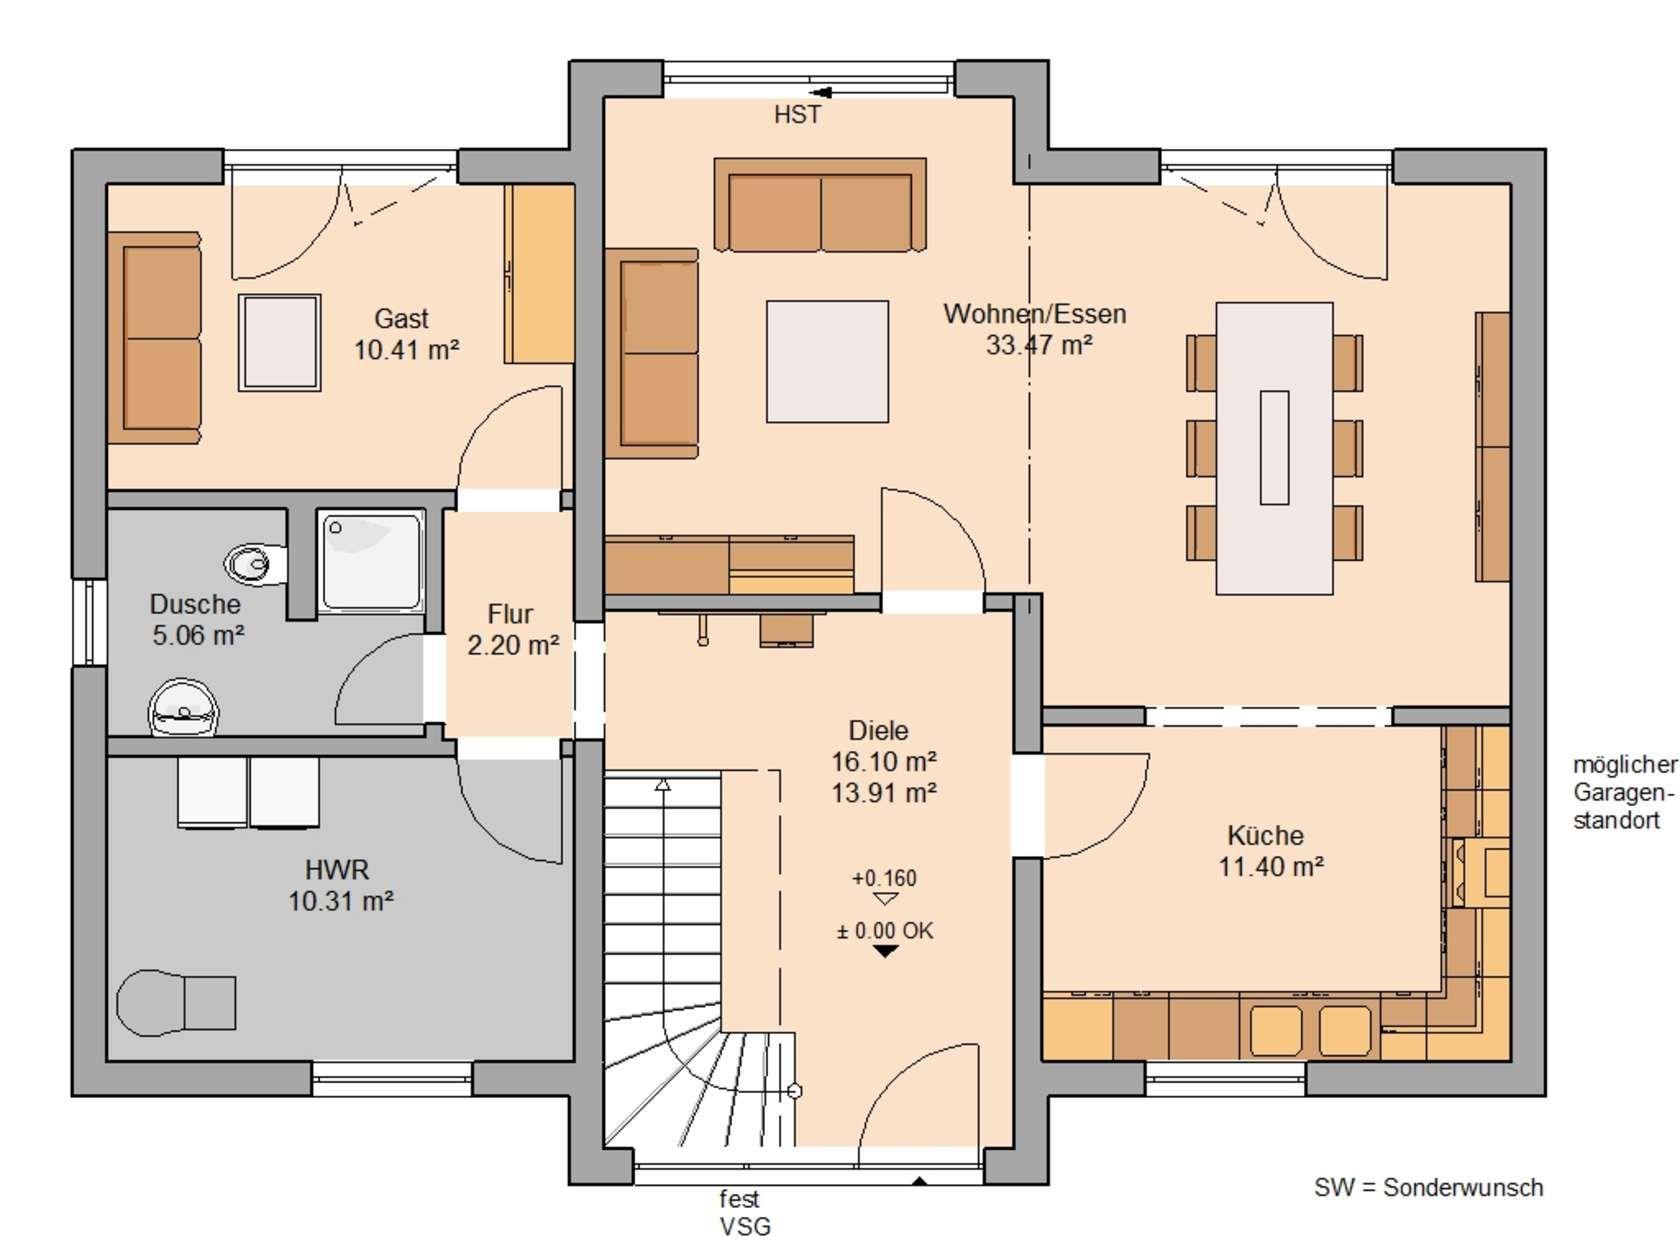 familienh user haus haus grundriss kern haus. Black Bedroom Furniture Sets. Home Design Ideas